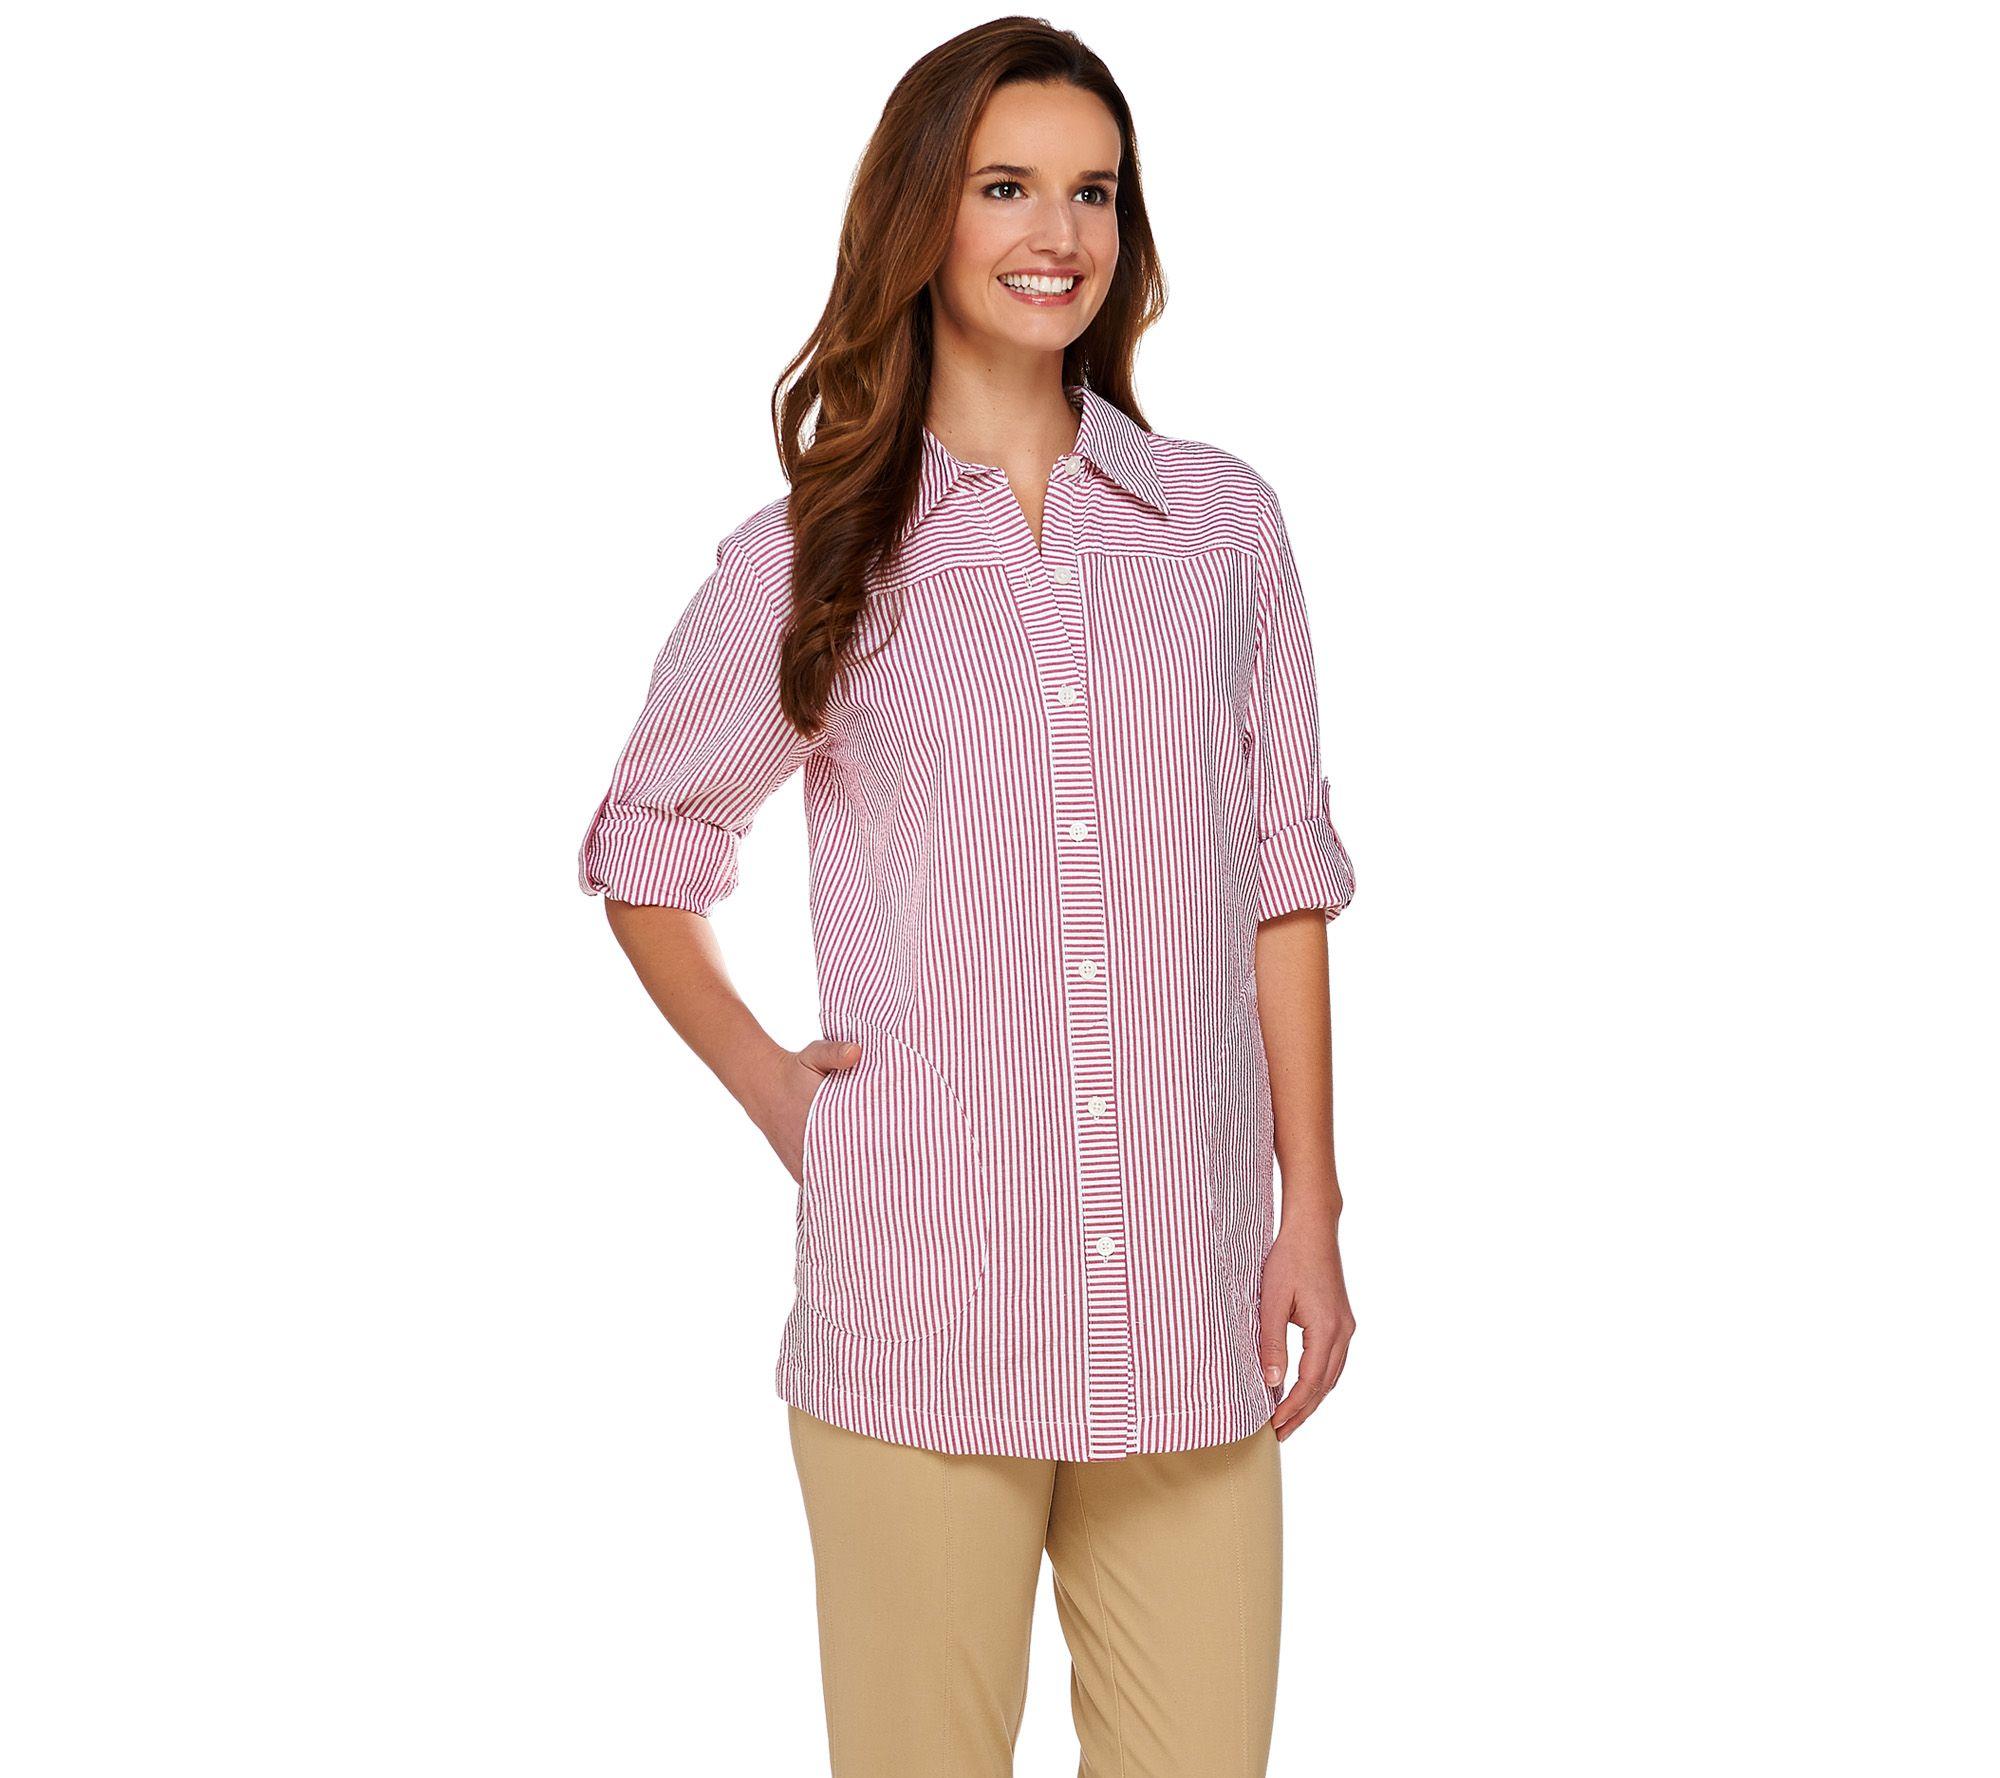 cae71665 Joan Rivers Seersucker Boyfriend Shirt w/ Long Sleeves - Page 1 — QVC.com